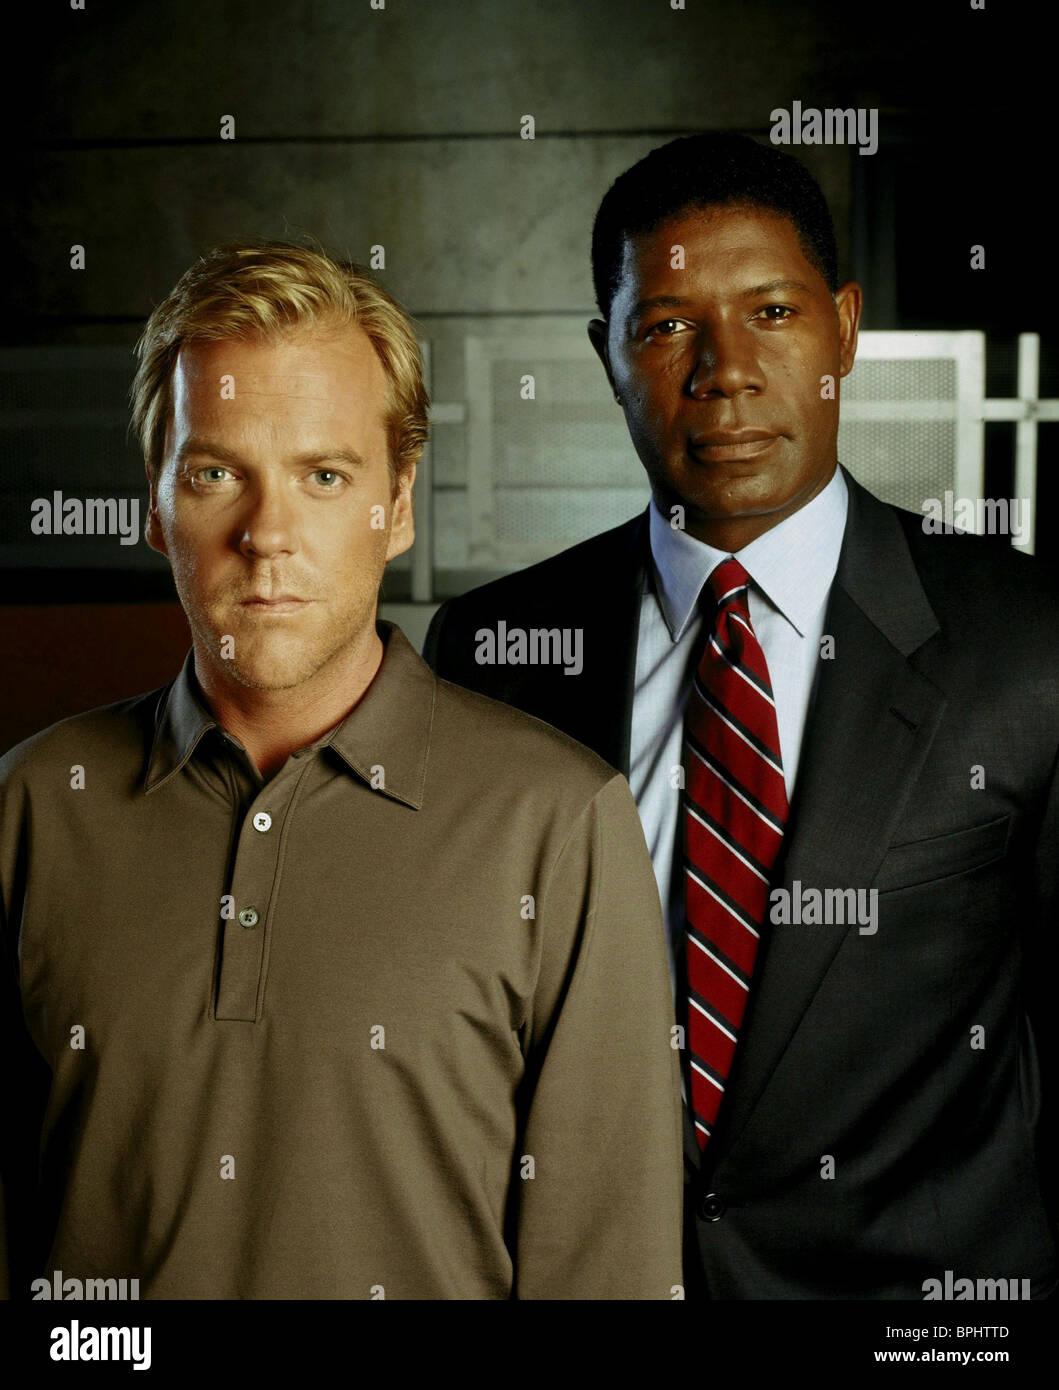 24 TV series Men of 24 | DVDbash |Dennis Haysbert 24